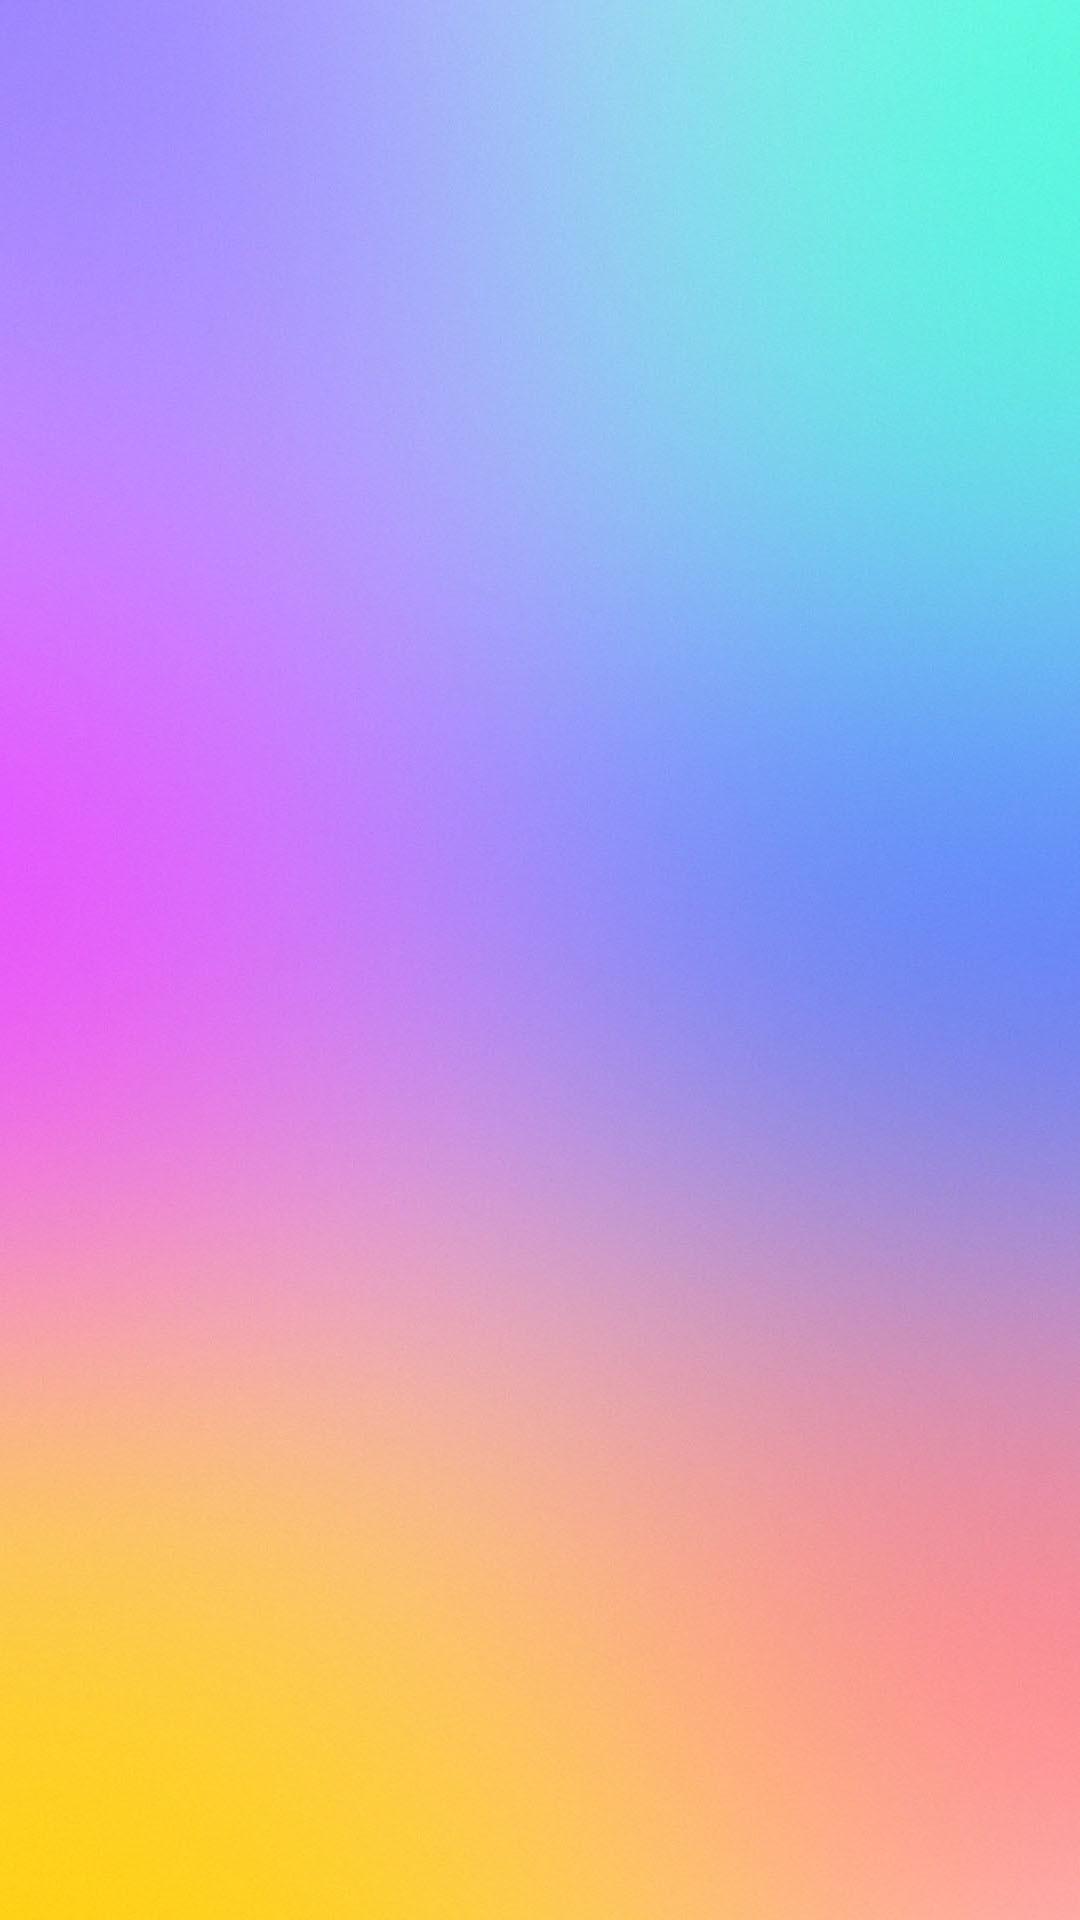 Rainbow Heart Wallpaper – iPhone